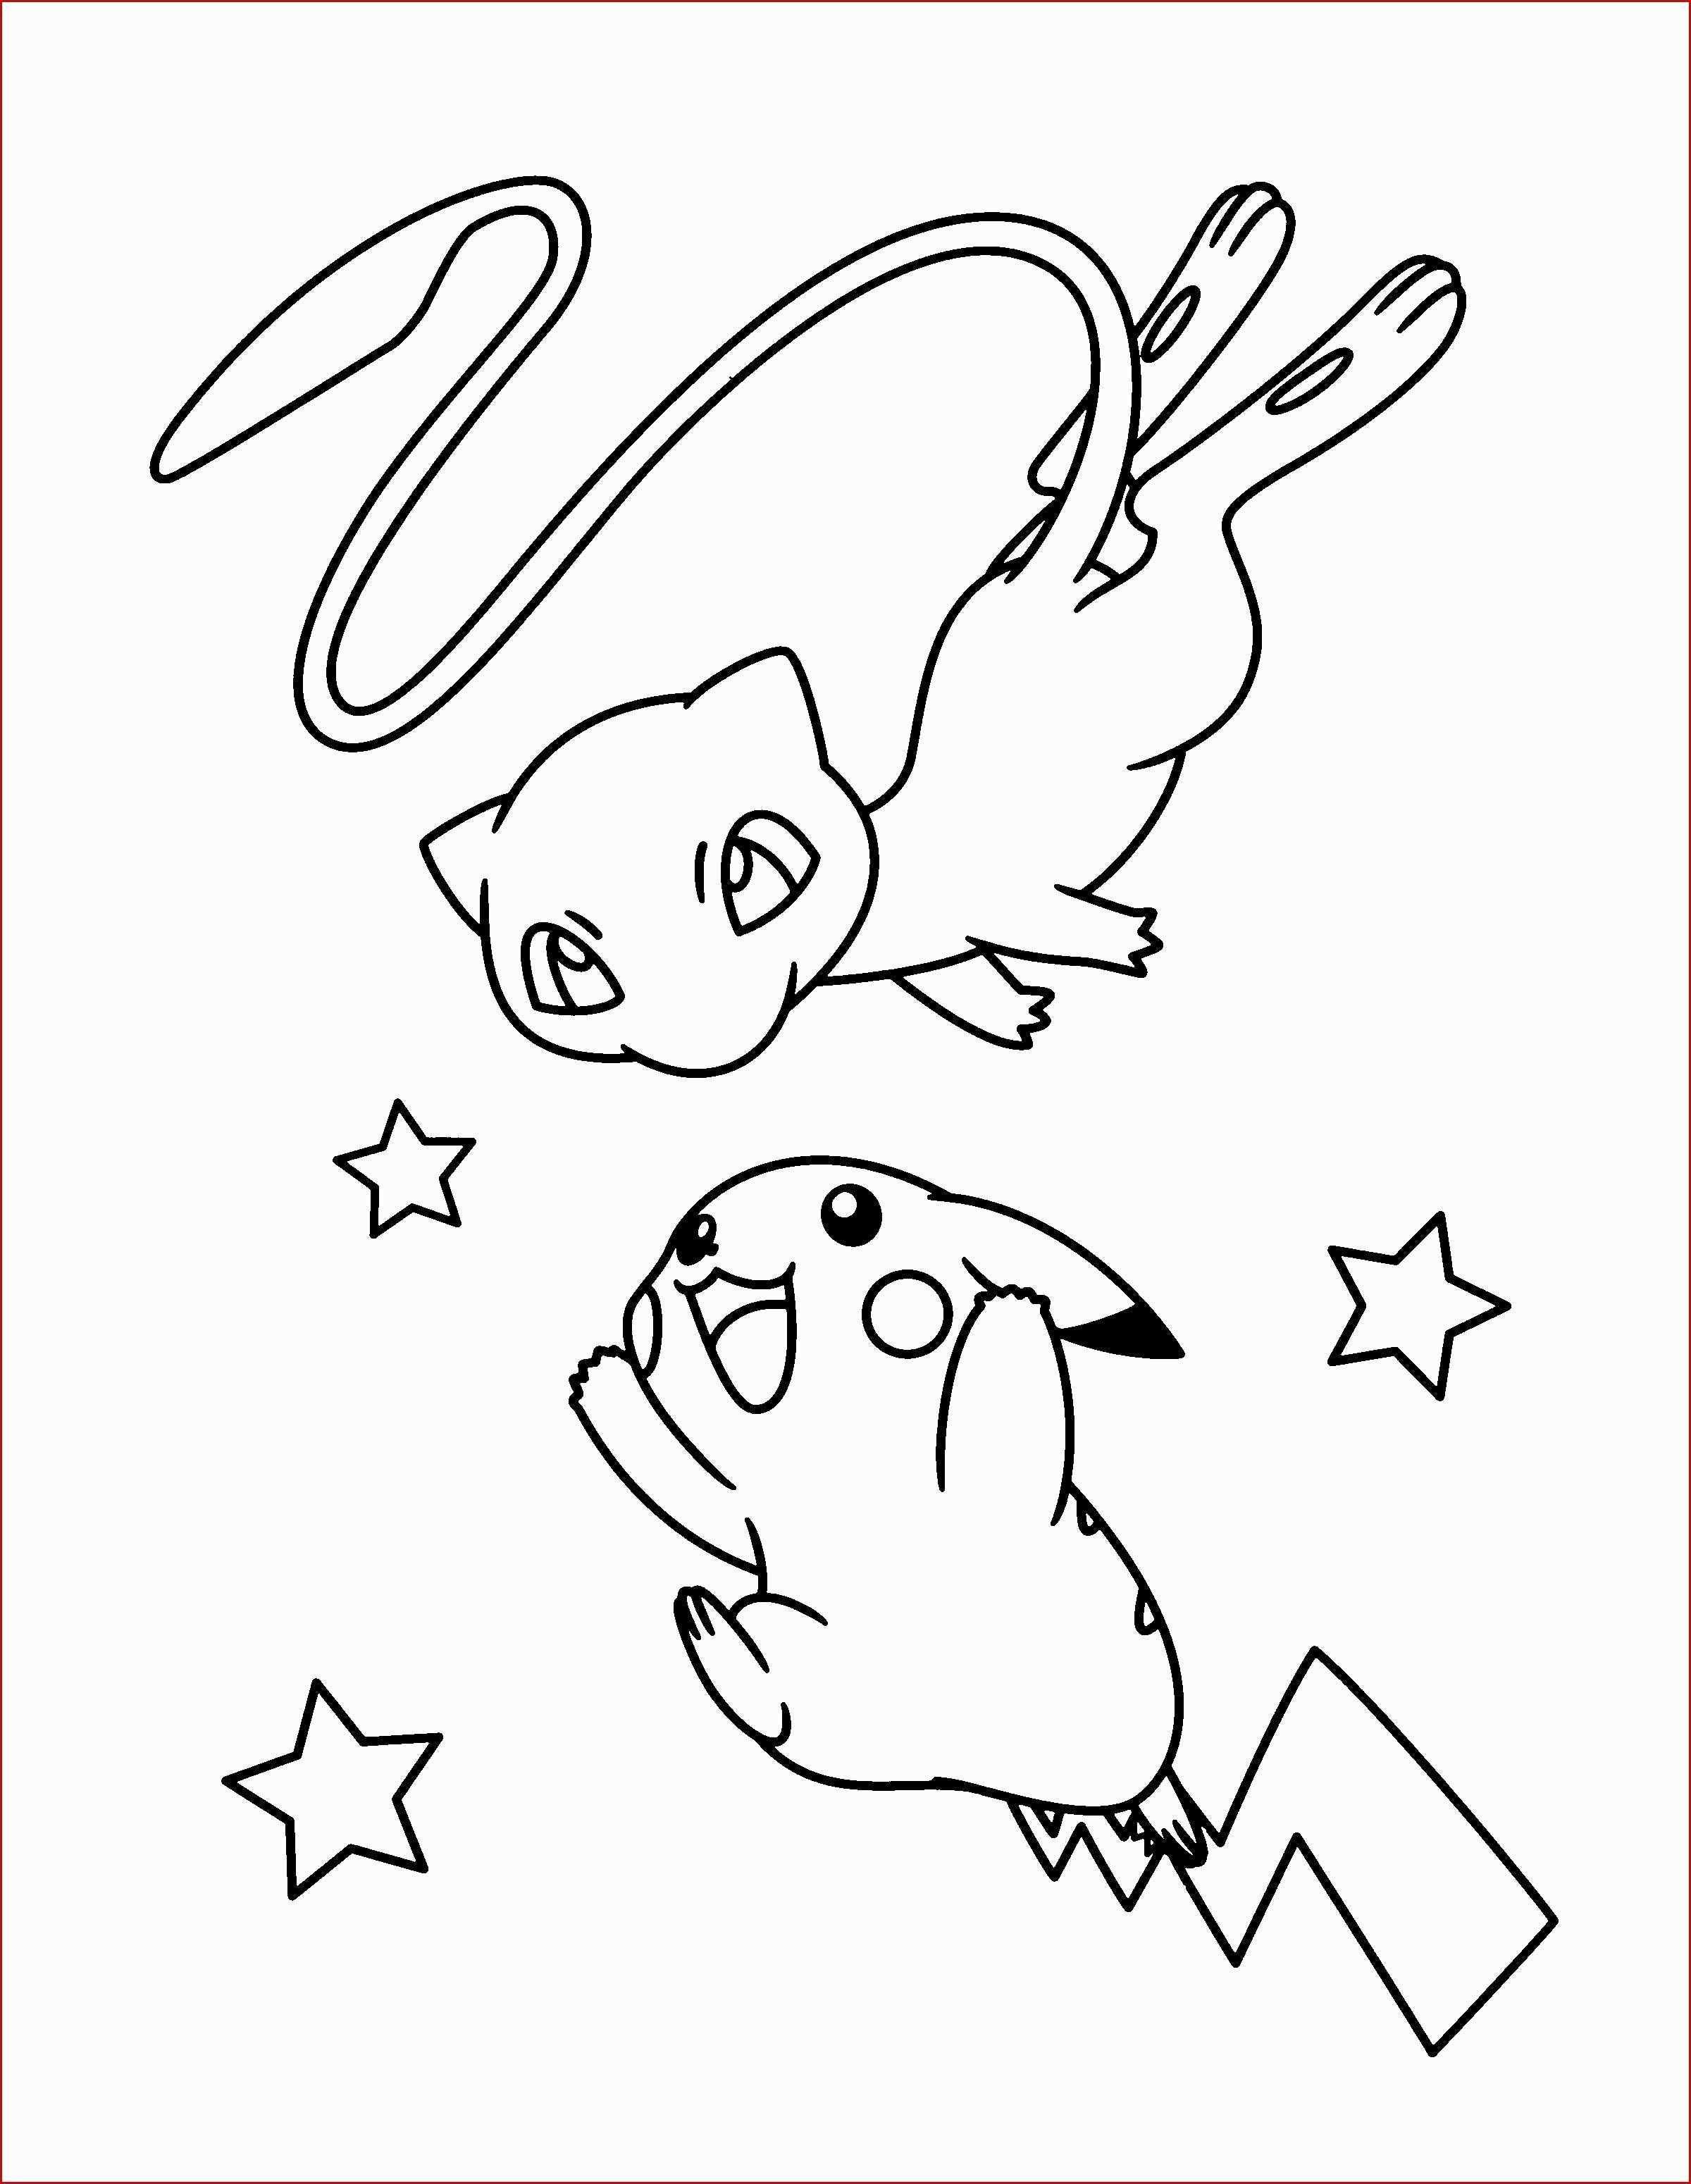 Pokemon Drawing Book Inspirational Pokemon Drawing Book 90 Frisch Pokemon Pikachu Pokemon Coloring Pages Pikachu Coloring Page Pokemon Coloring